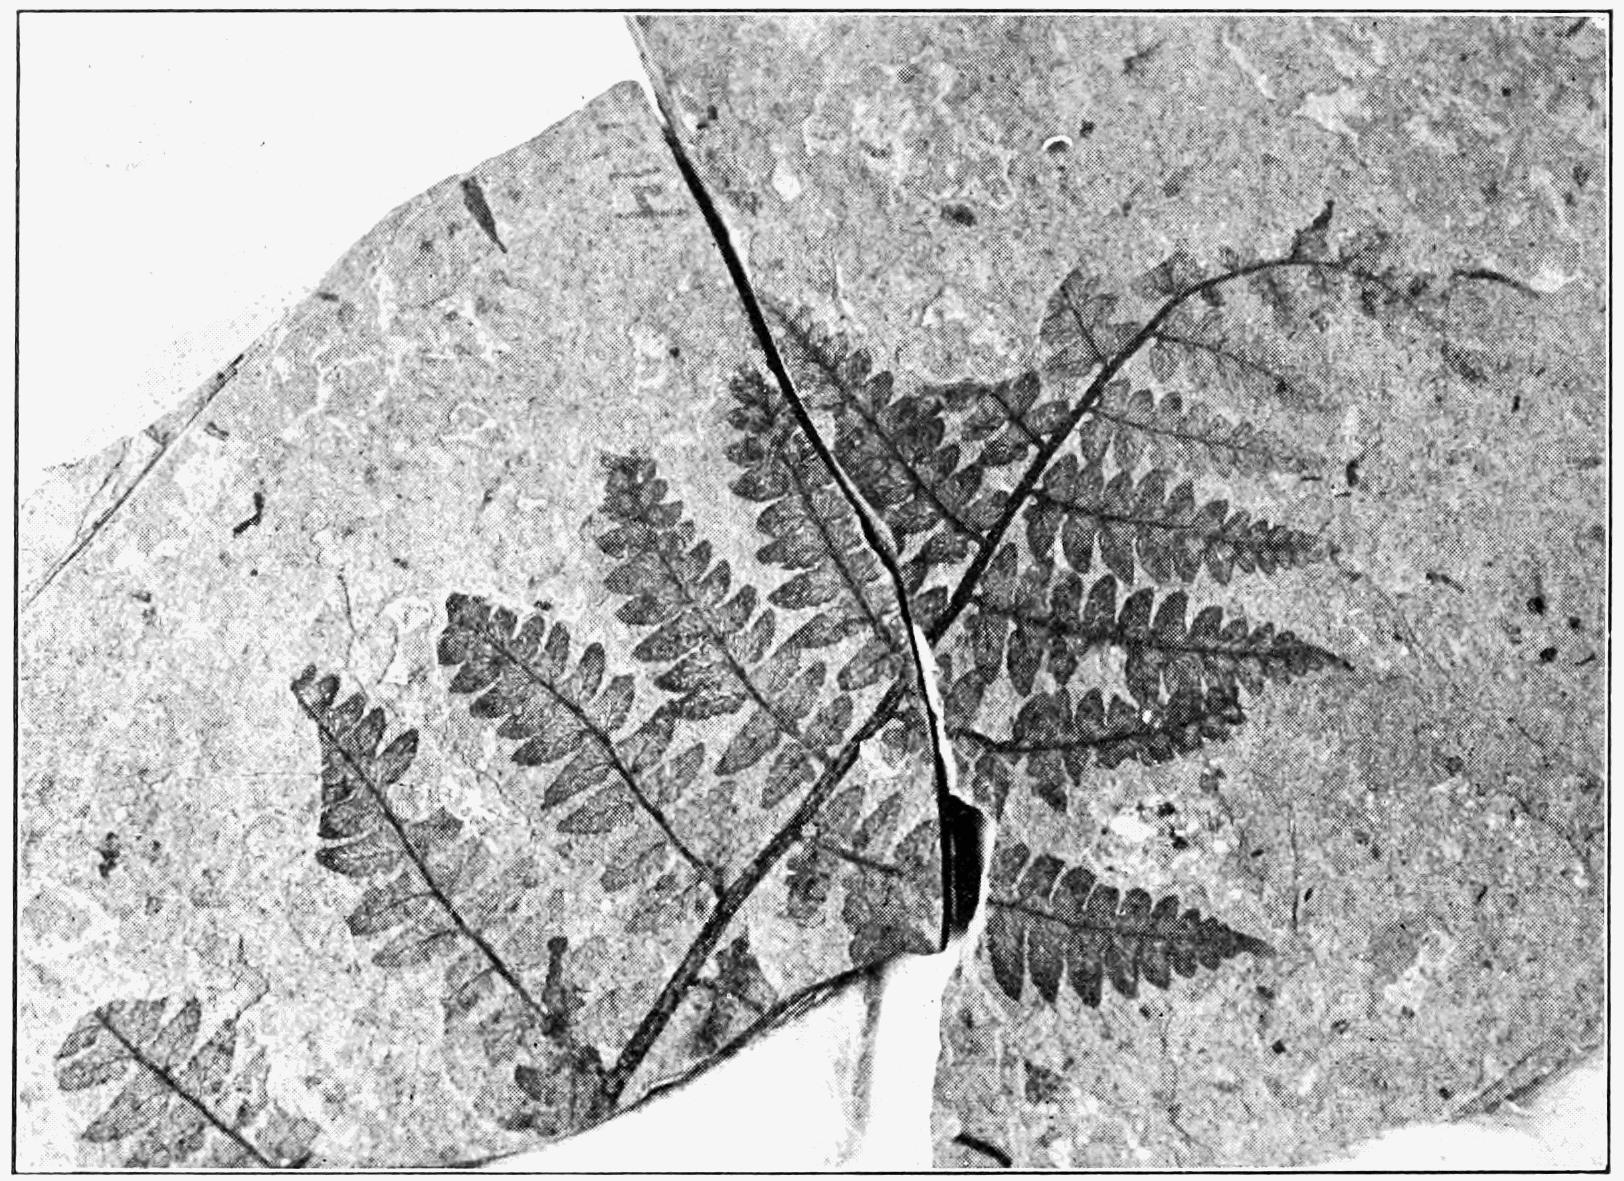 File:PSM V73 D124 Fossil fern phegopteris guyottii.png